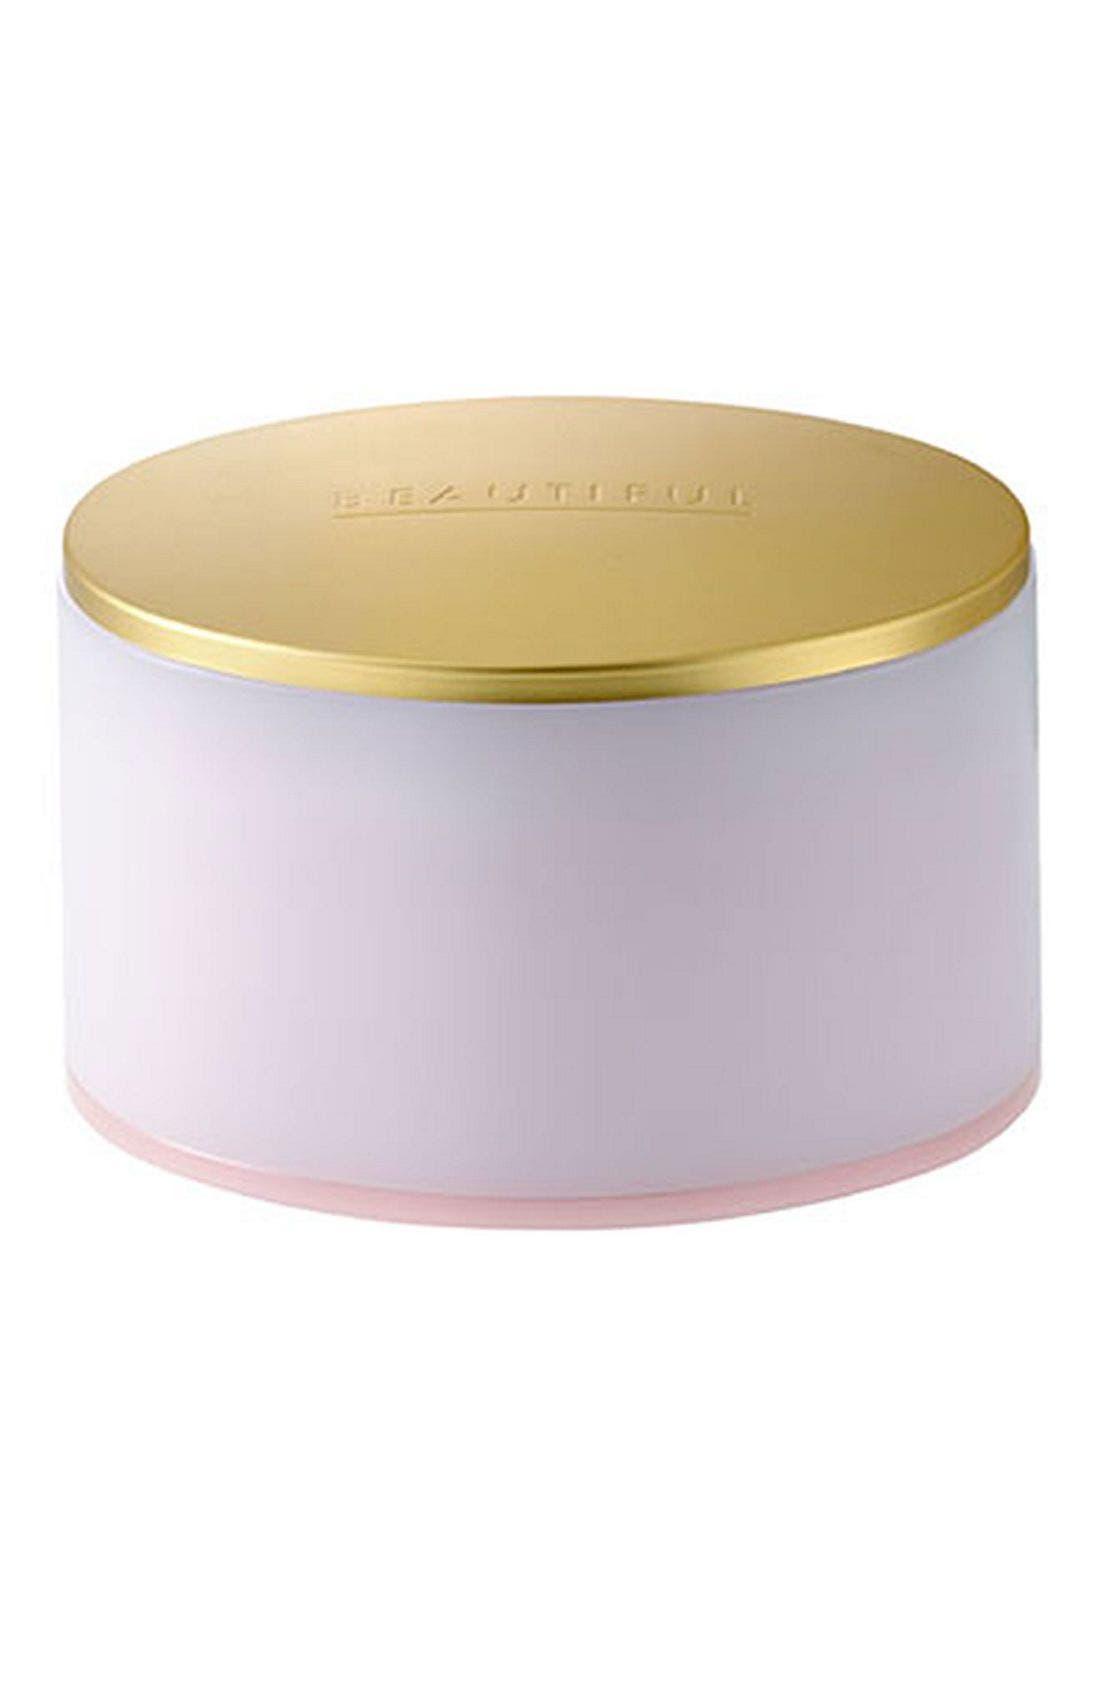 Estée Lauder Beautiful Perfumed Body Powder with Puff